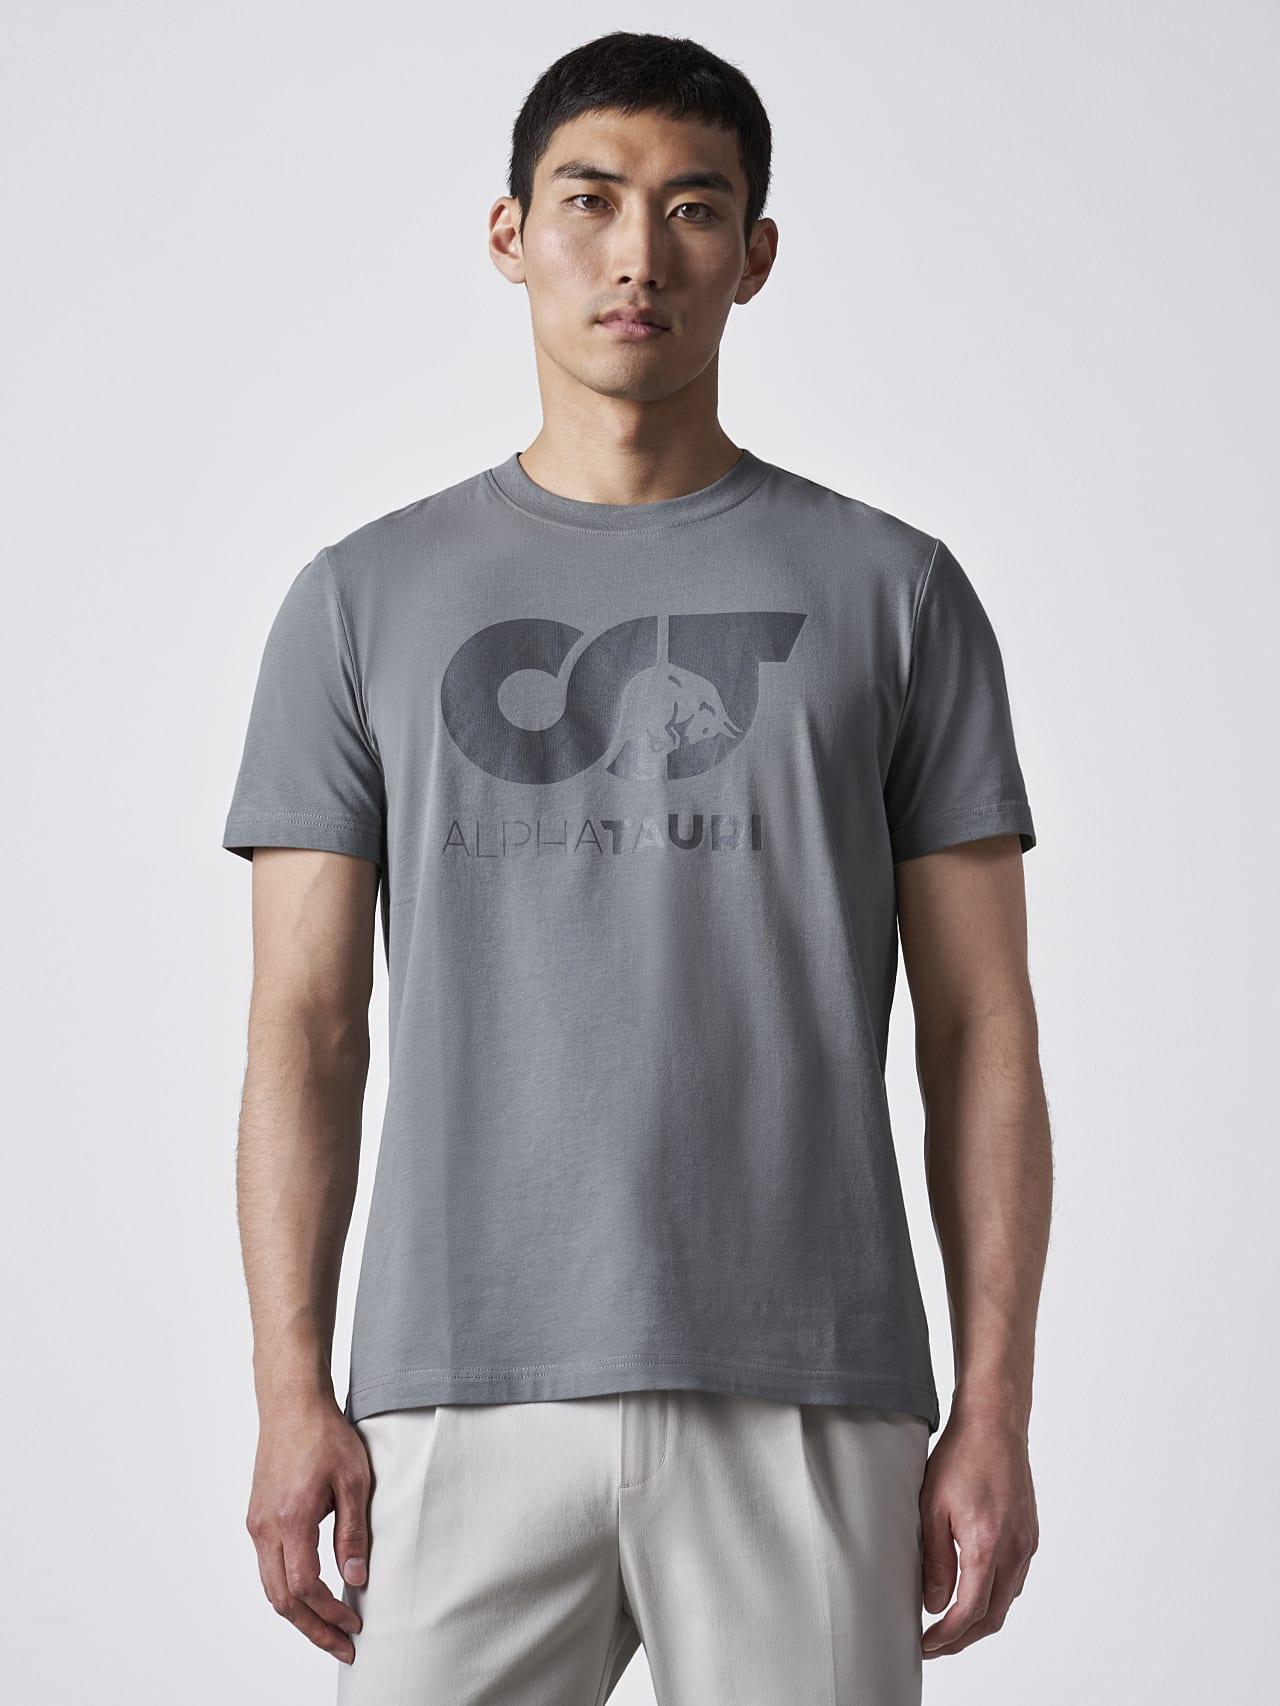 JERO V2.Y4.02 Signature Logo T-Shirt Grey Model shot Alpha Tauri